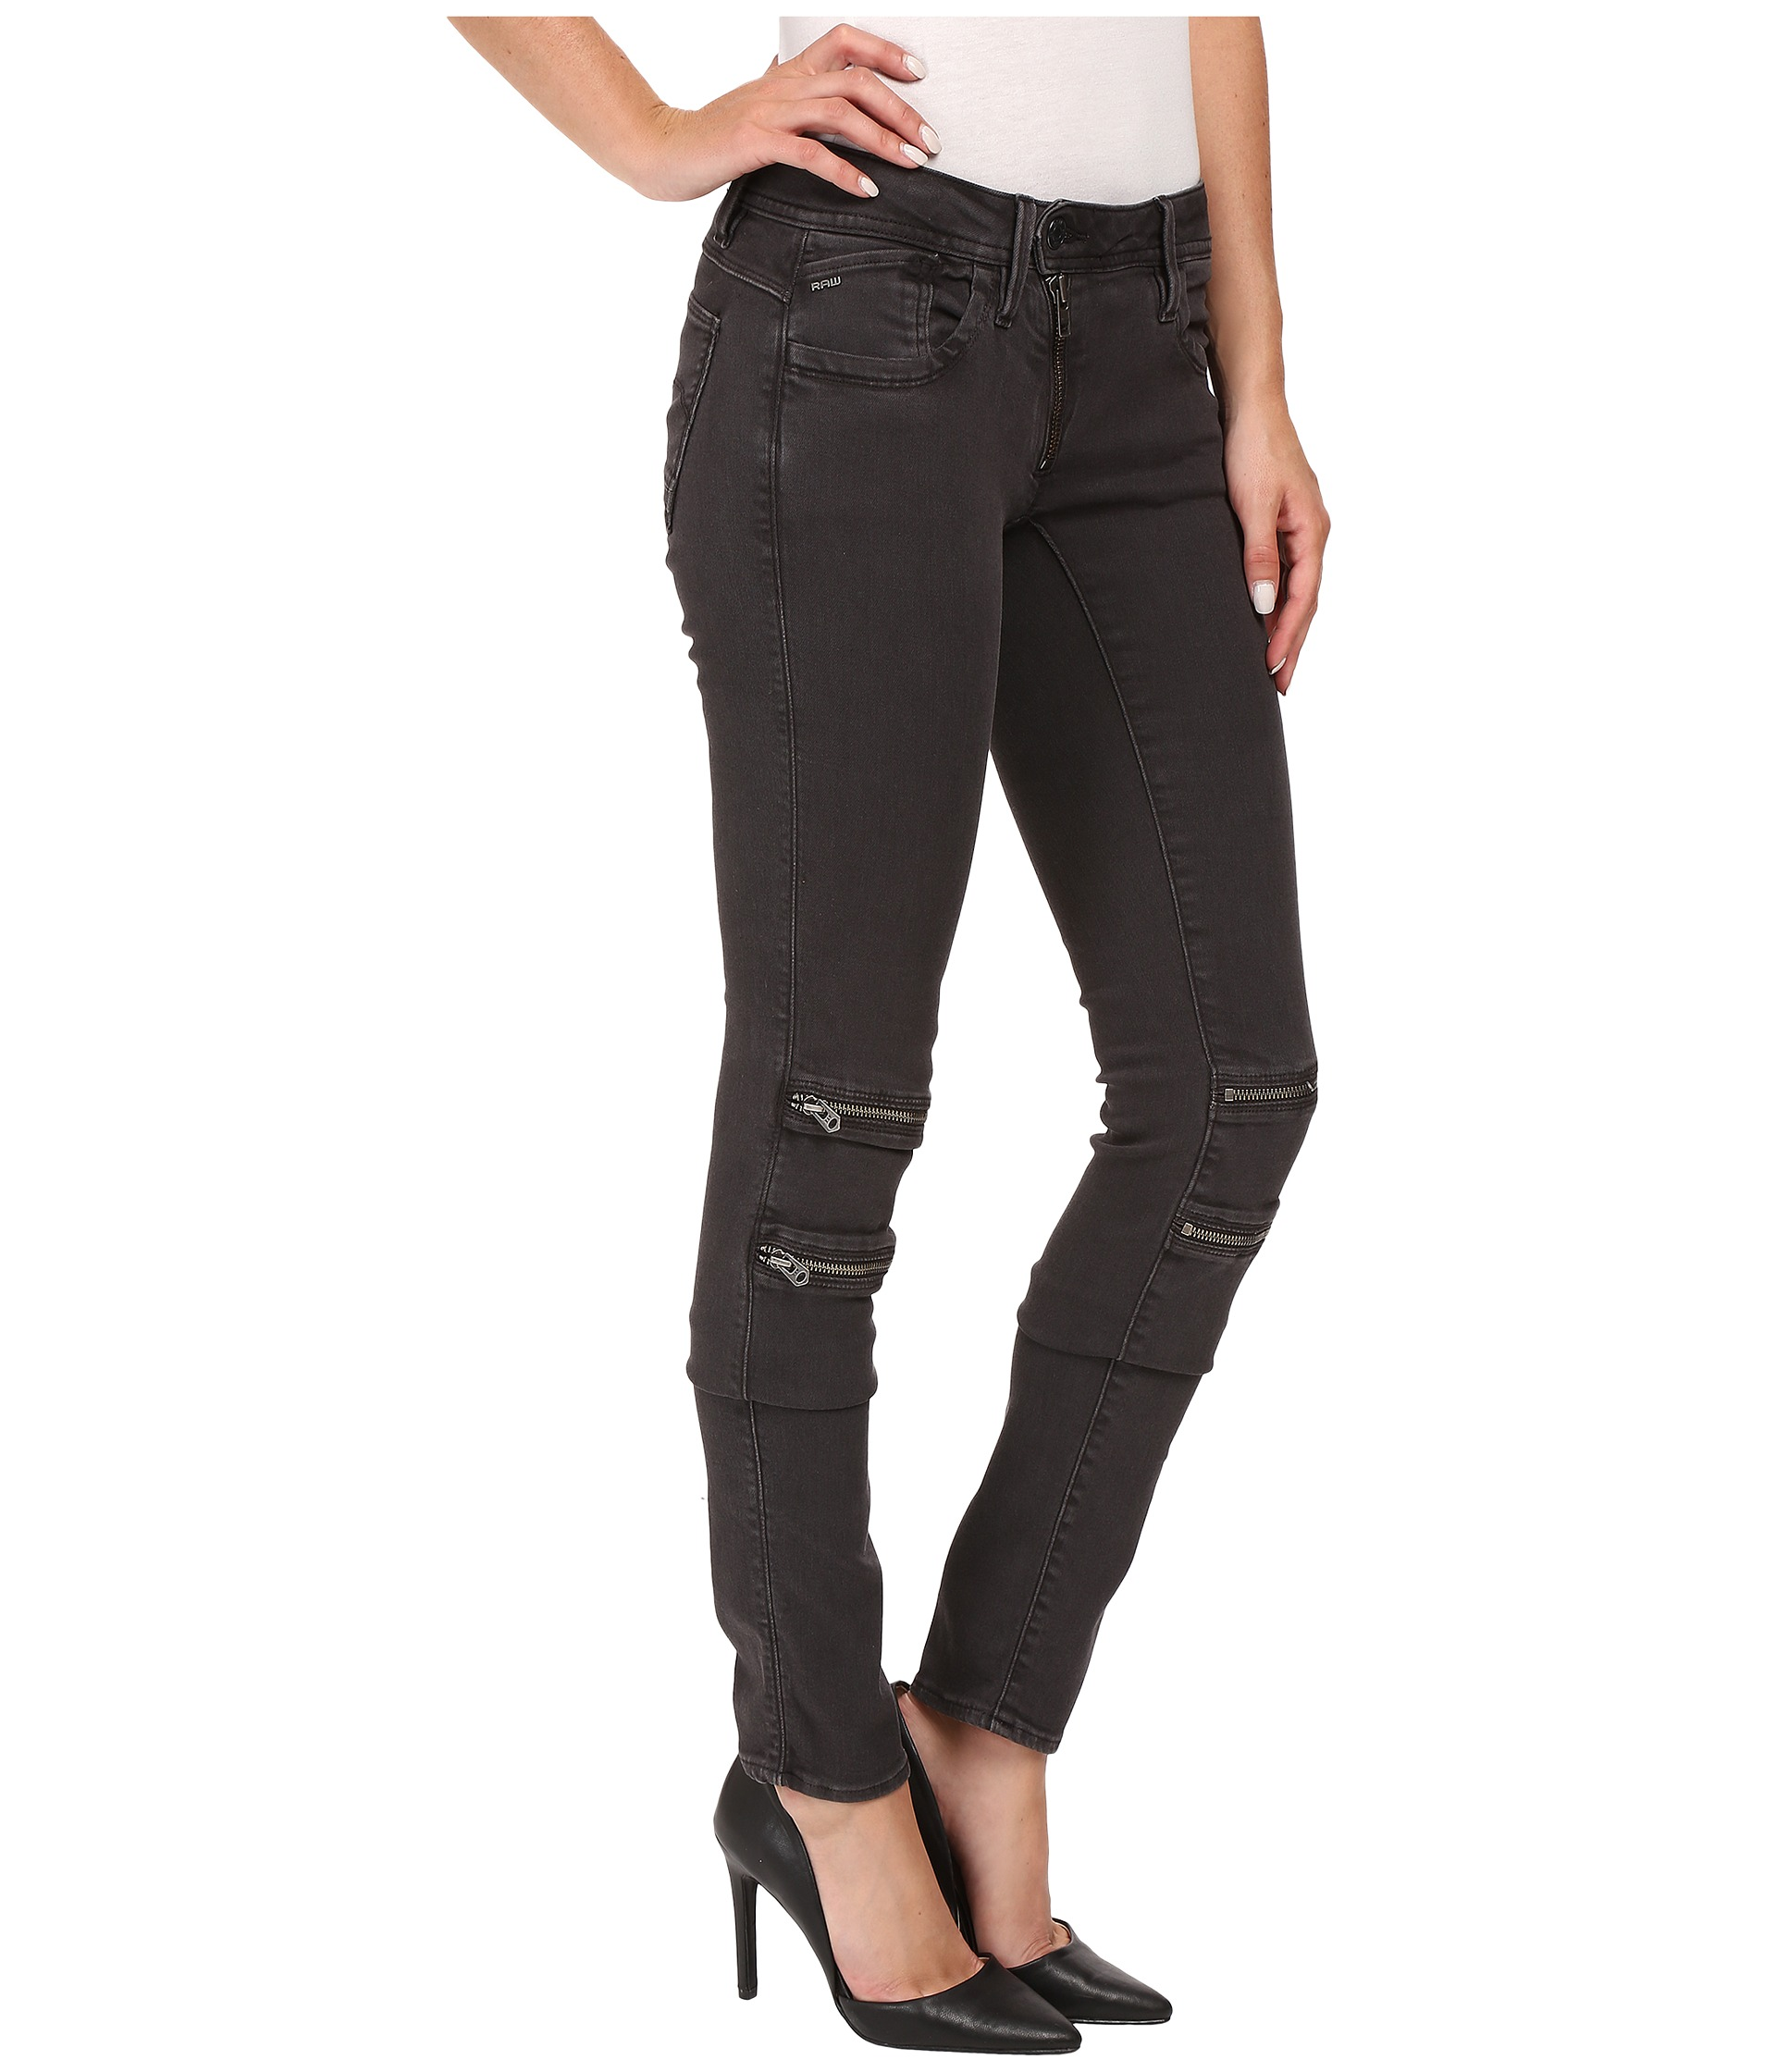 g star lynn custom mid skinny jeans in slander superstretch crieff black crieff black zappos. Black Bedroom Furniture Sets. Home Design Ideas